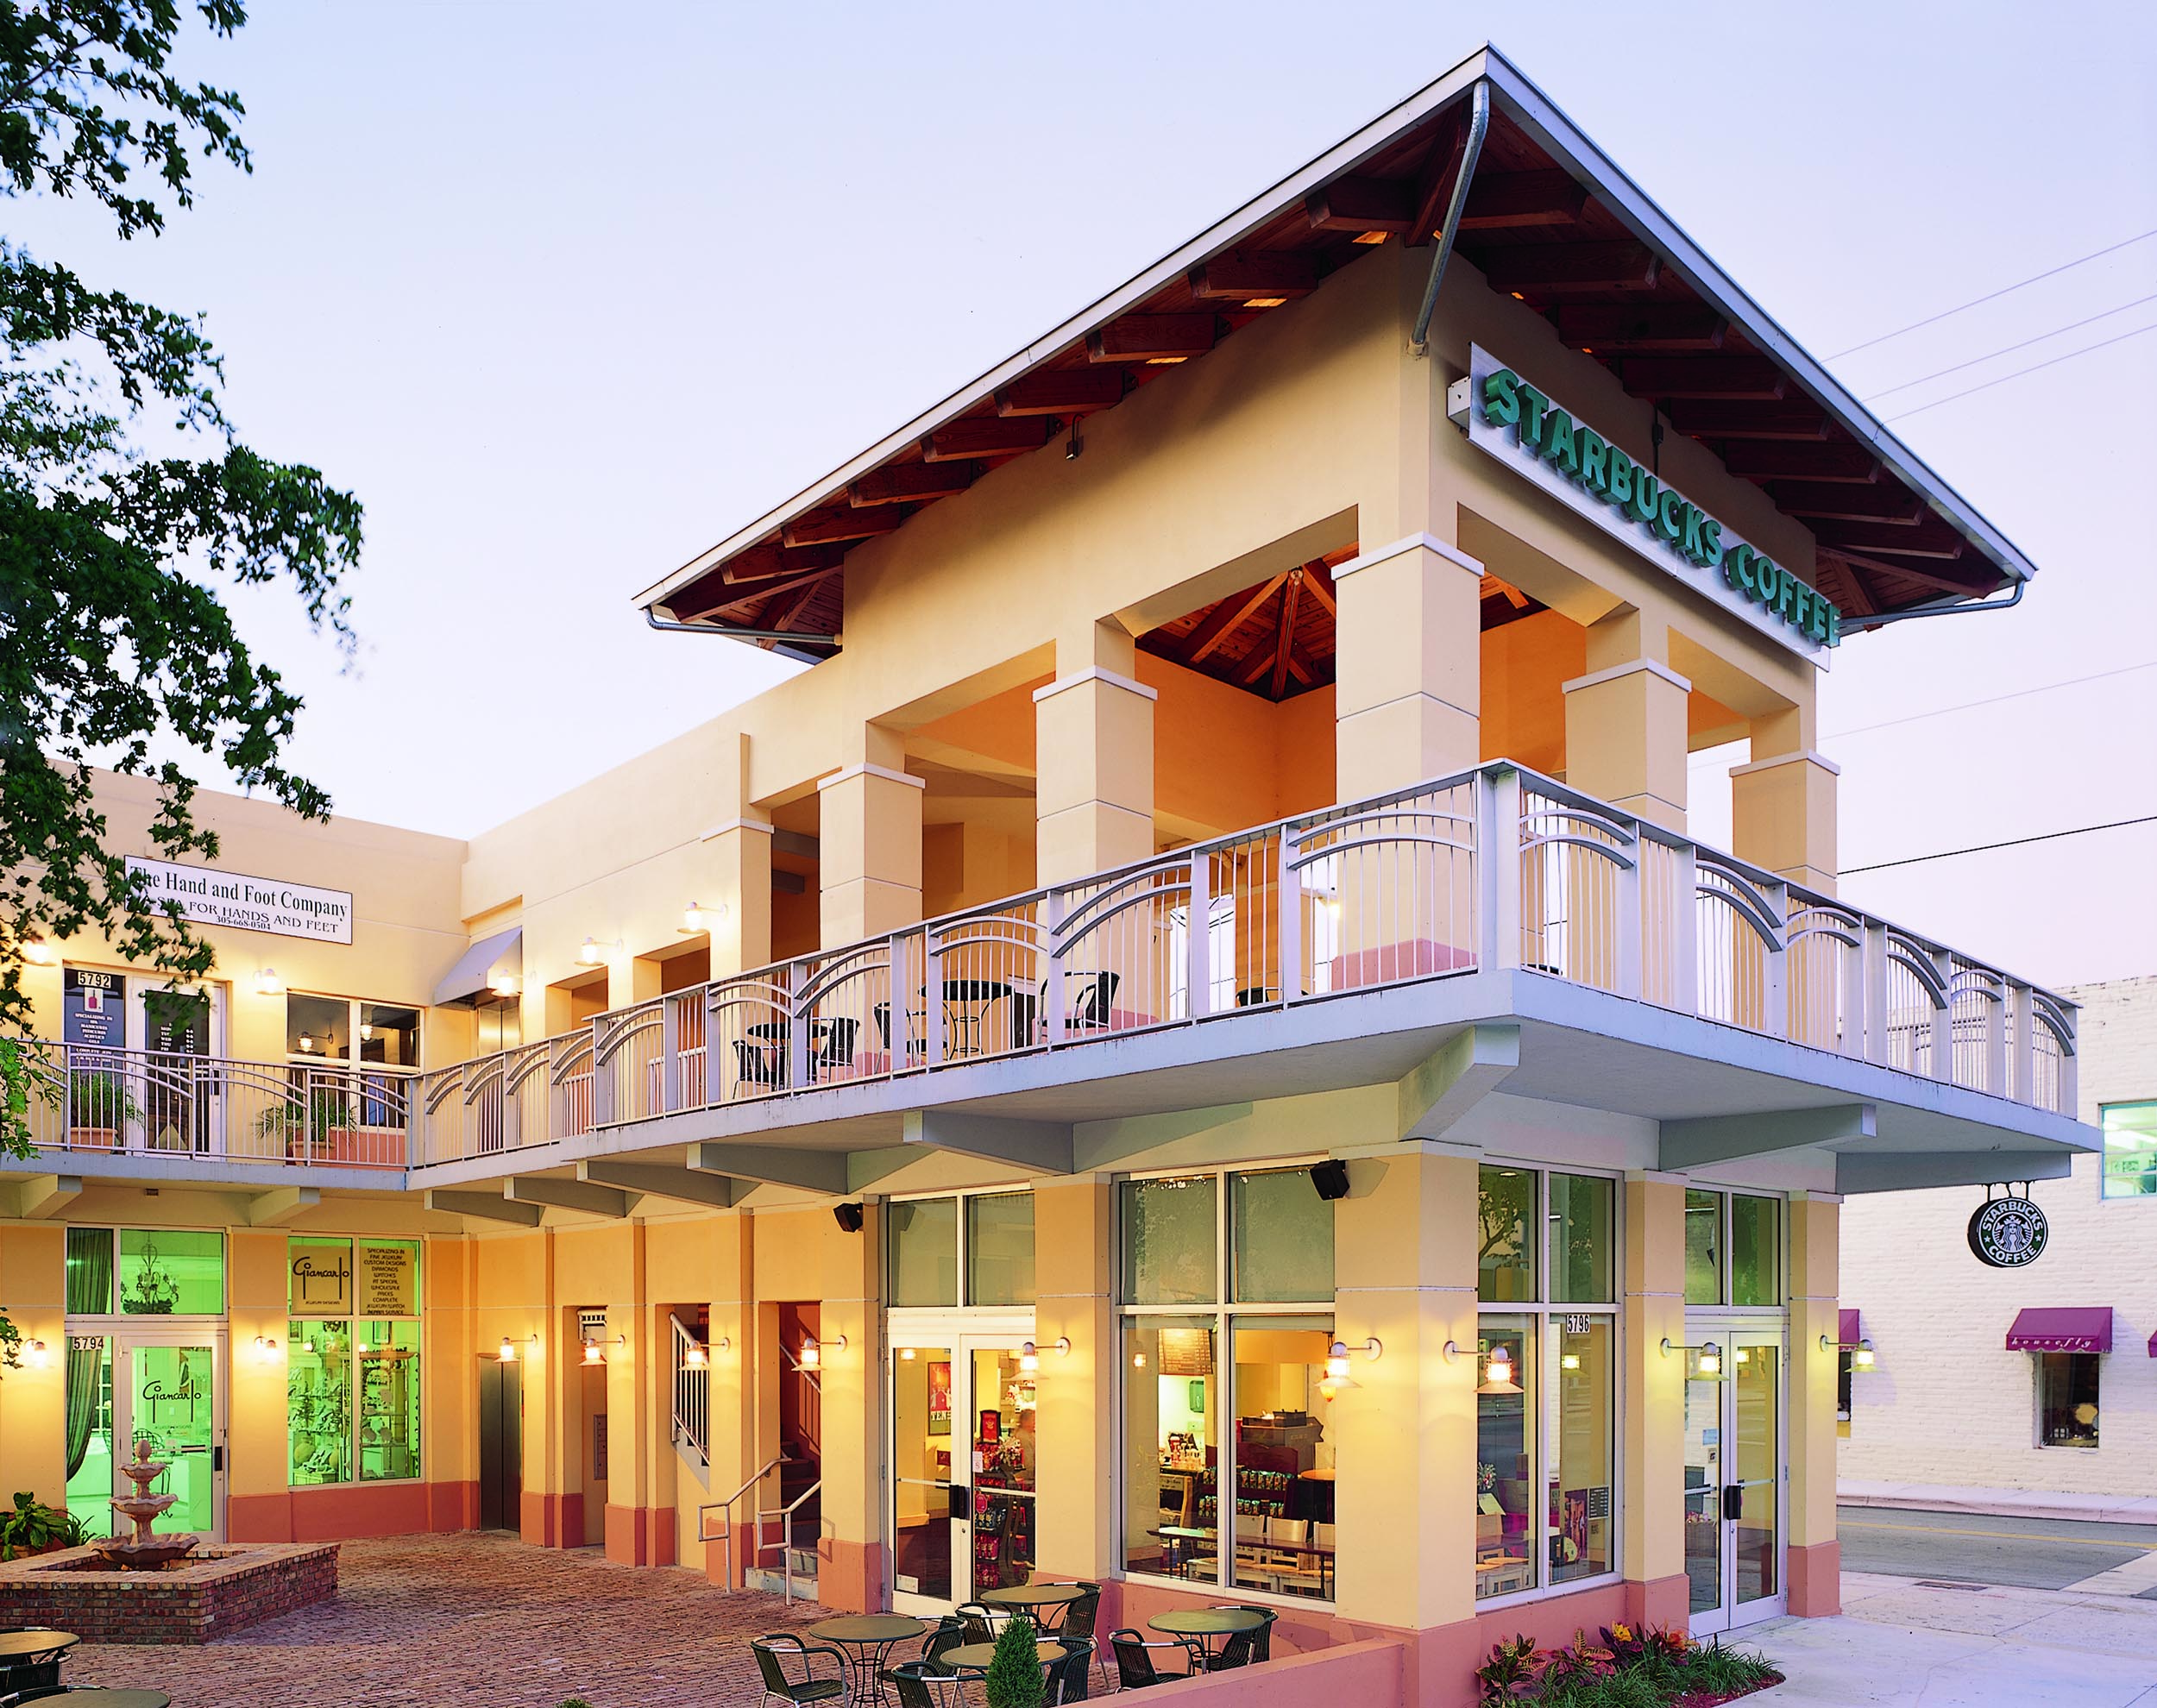 South Miami Starbucks.jpg